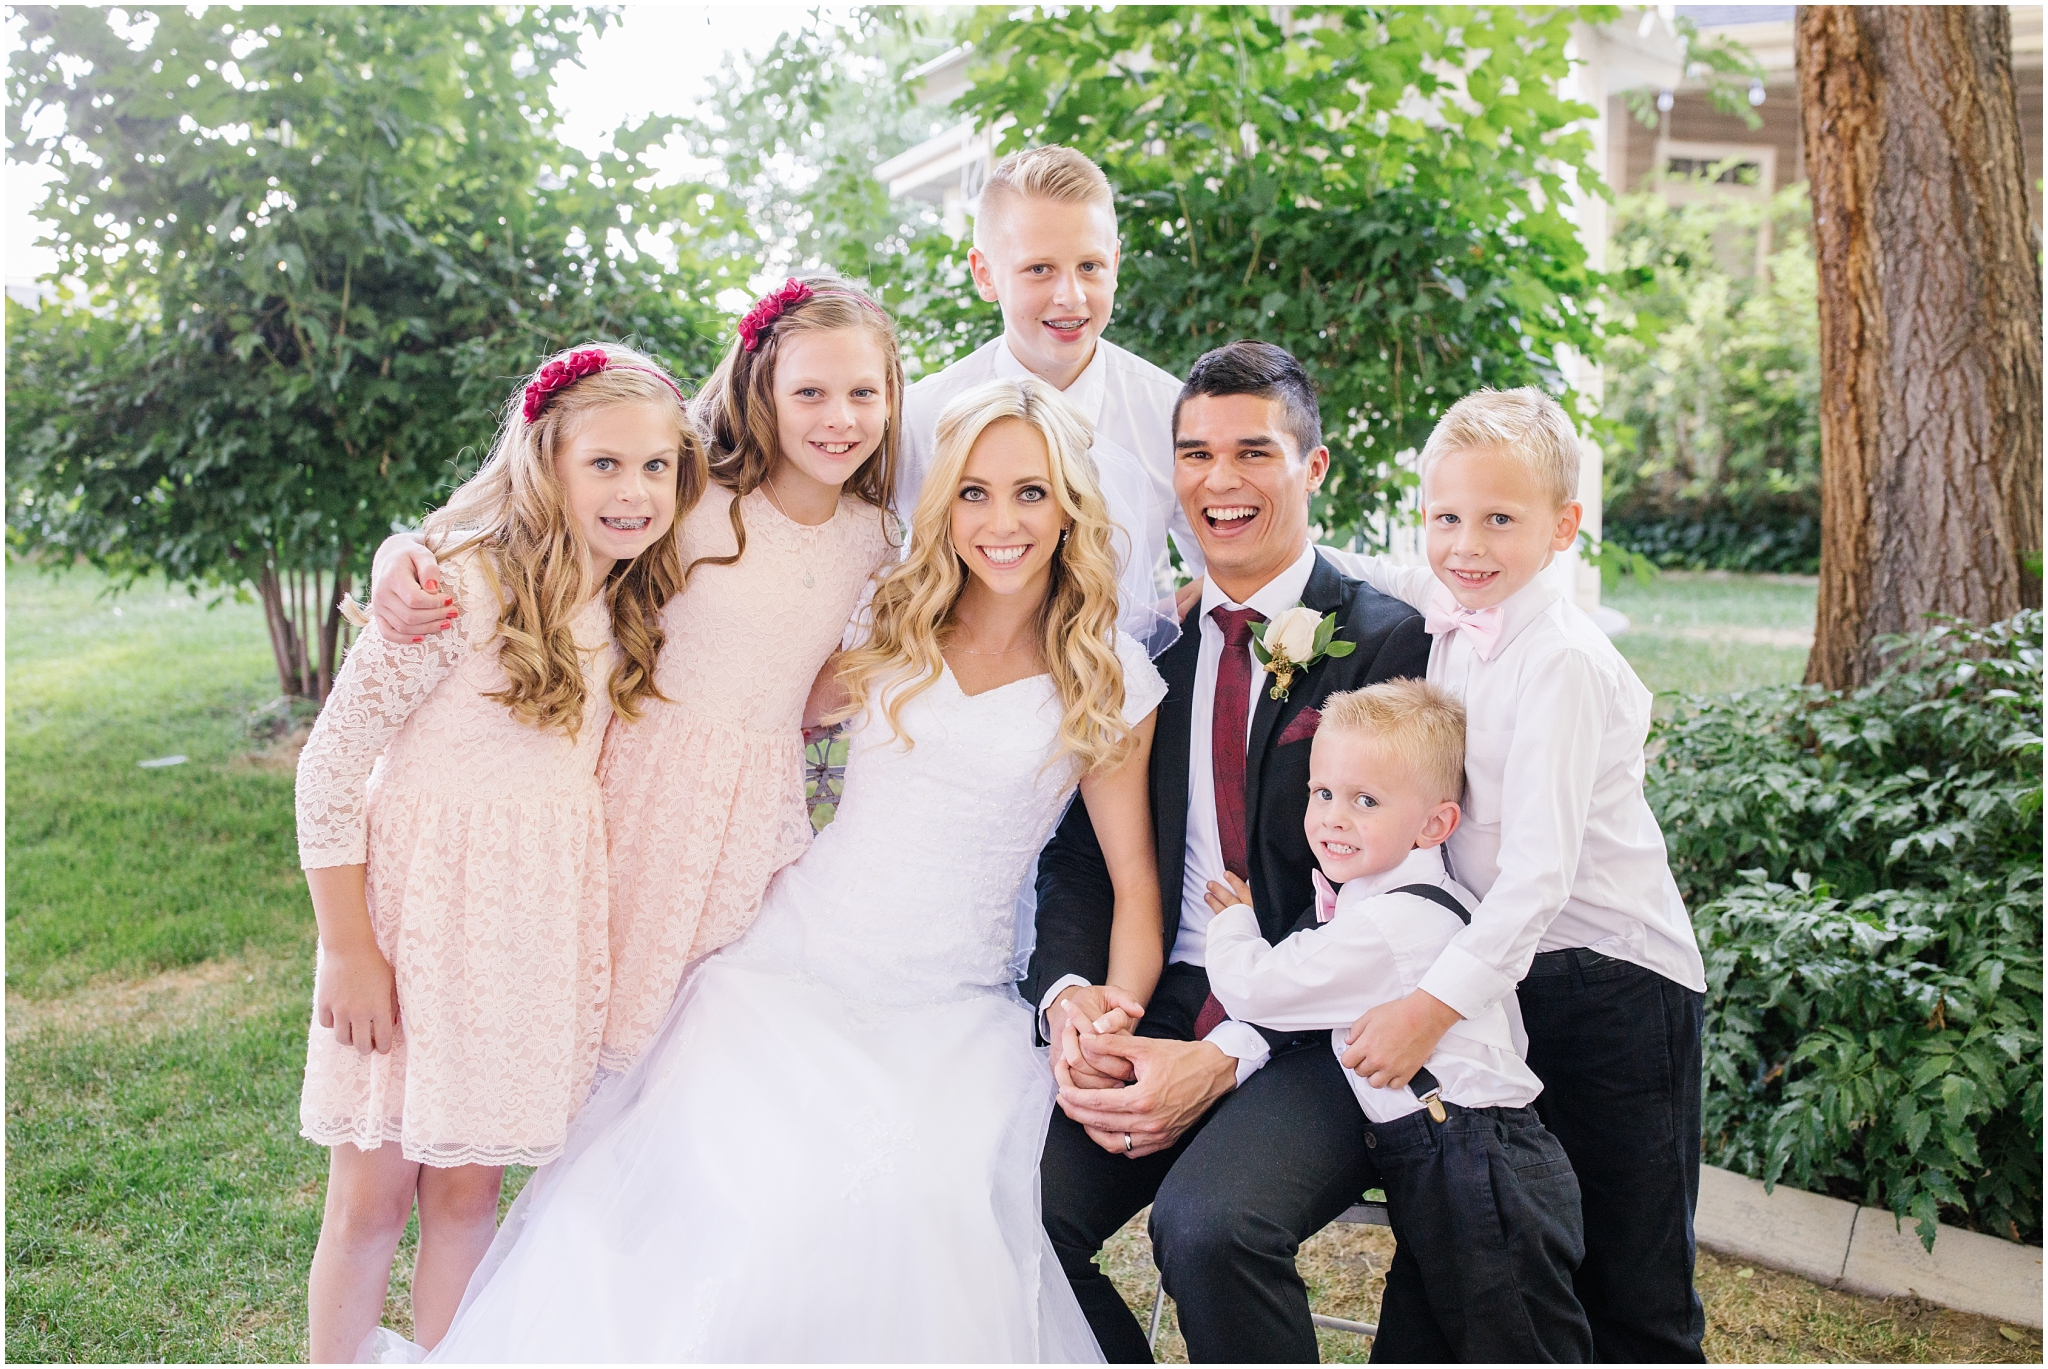 HannahChaseWedding-308_Lizzie-B-Imagery-Utah-Wedding-Photographer-Park-City-Salt-Lake-City-Payson-Temple-Clarion-Garden-Center.jpg